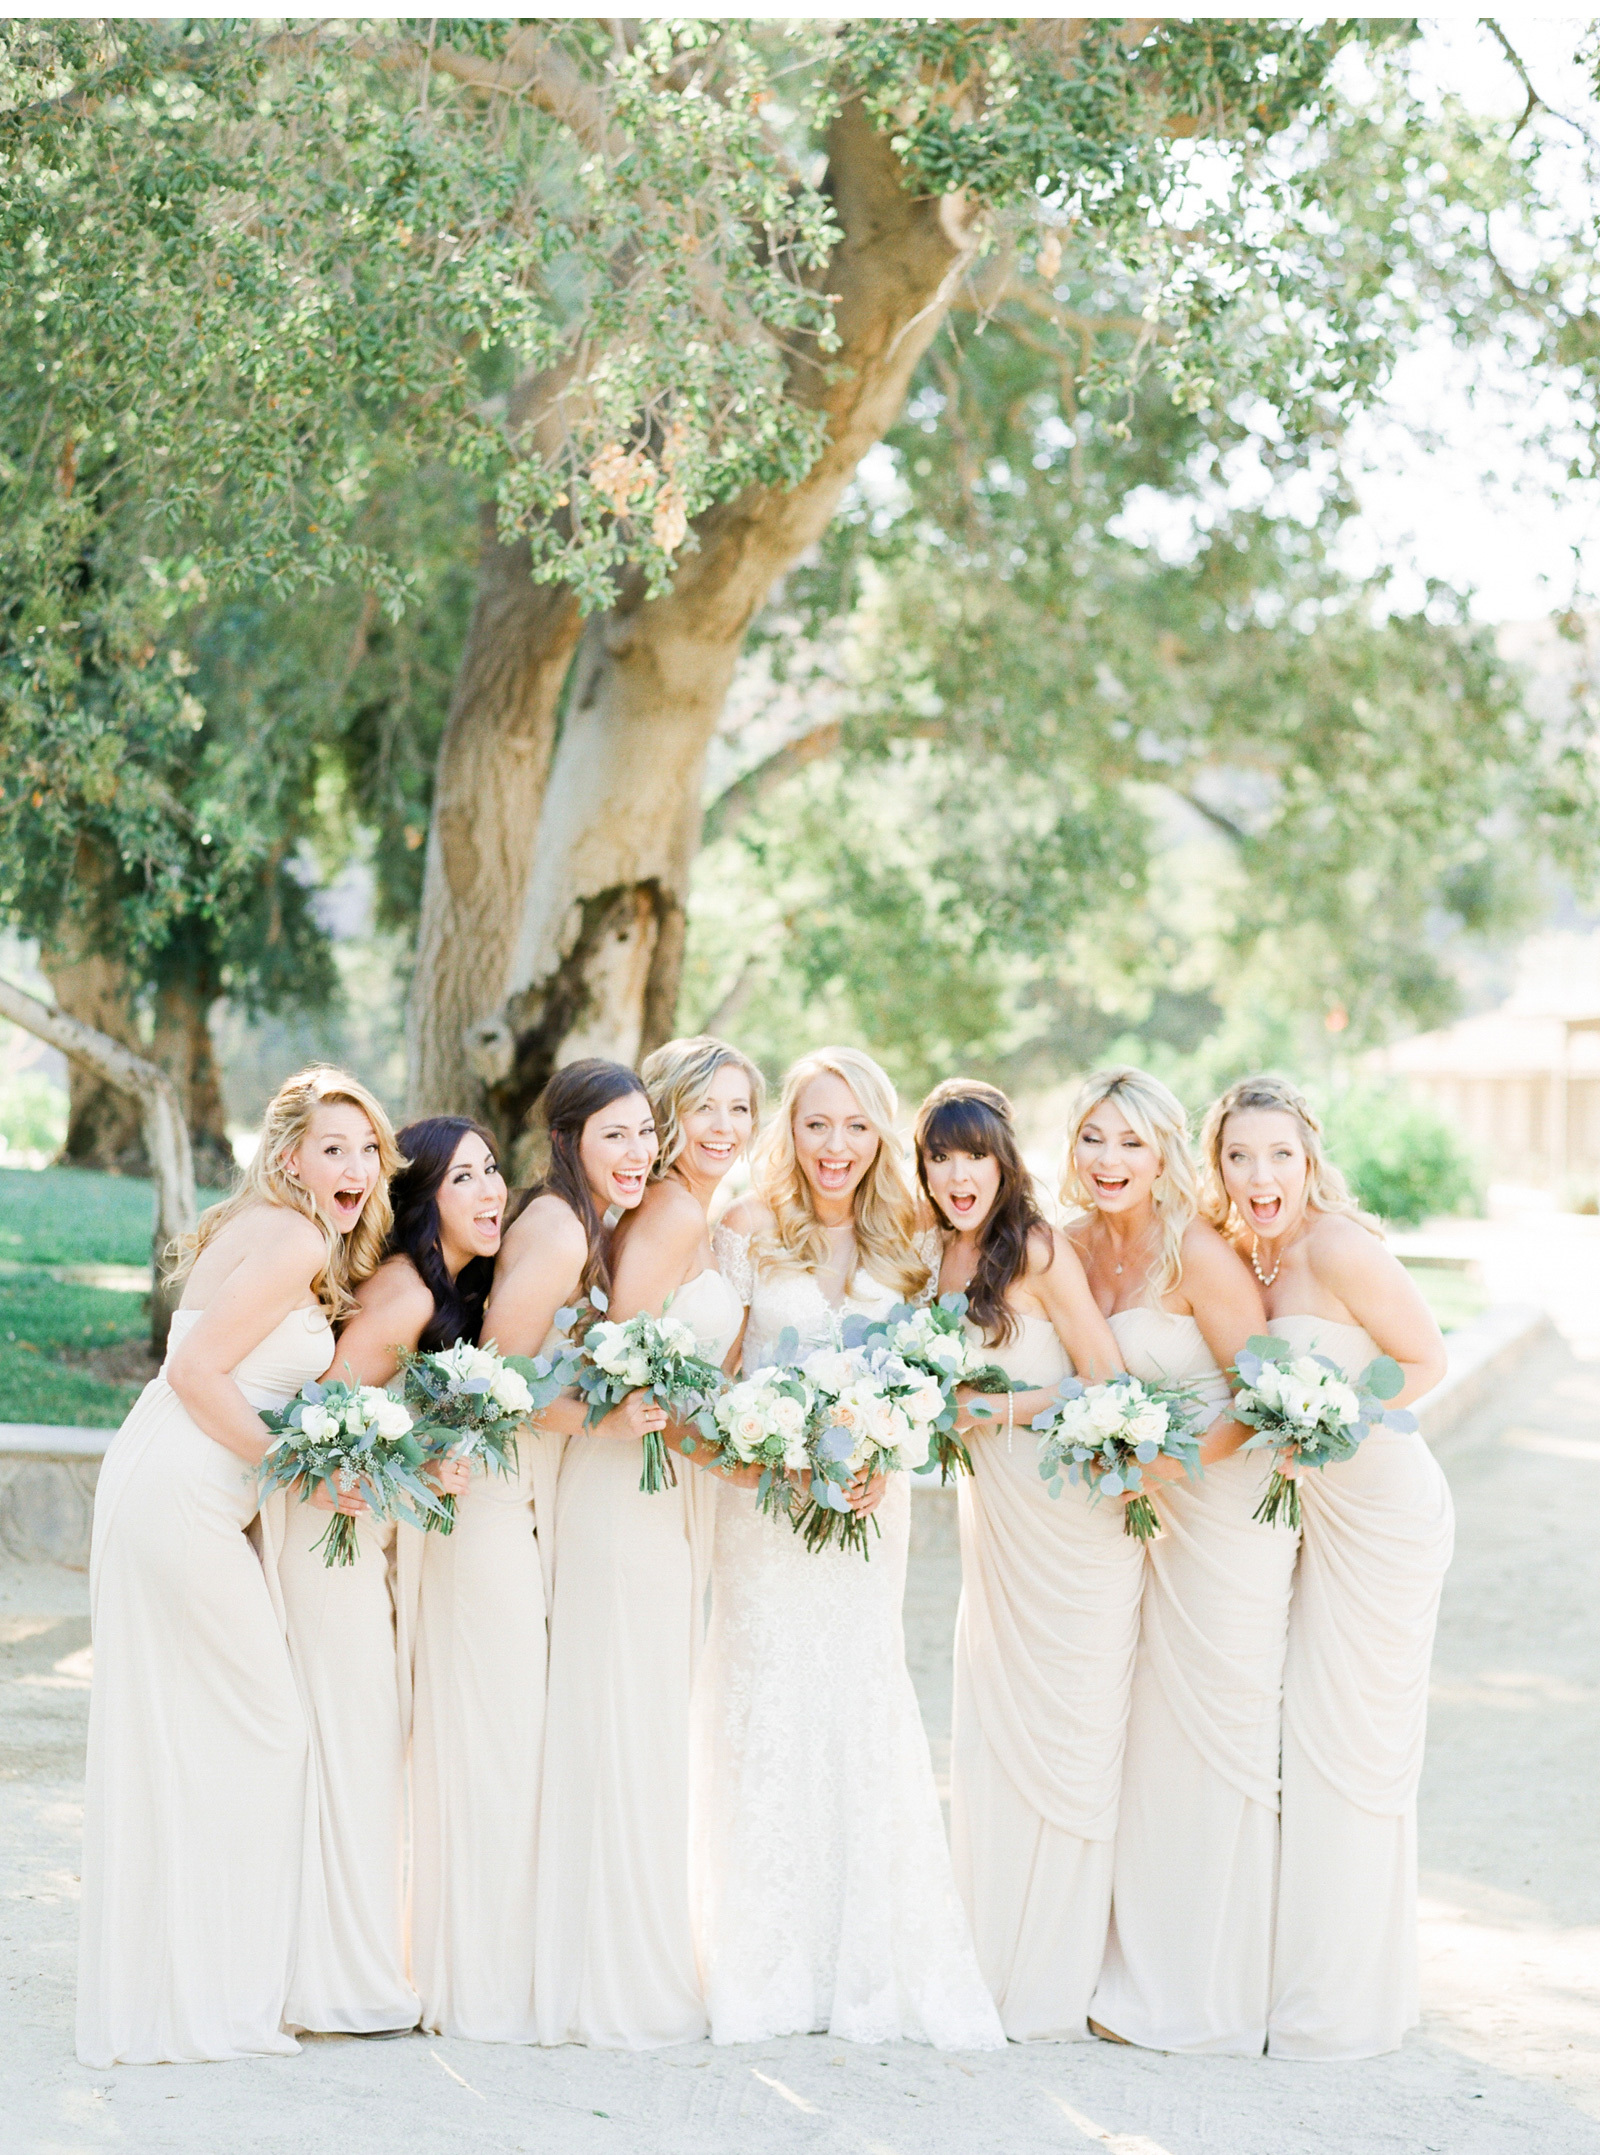 Triunfo-Orange-County-Temecula-Wedding-Photographer-Style-Me-Pretty-Natalie-Schutt-Photography_12.jpg